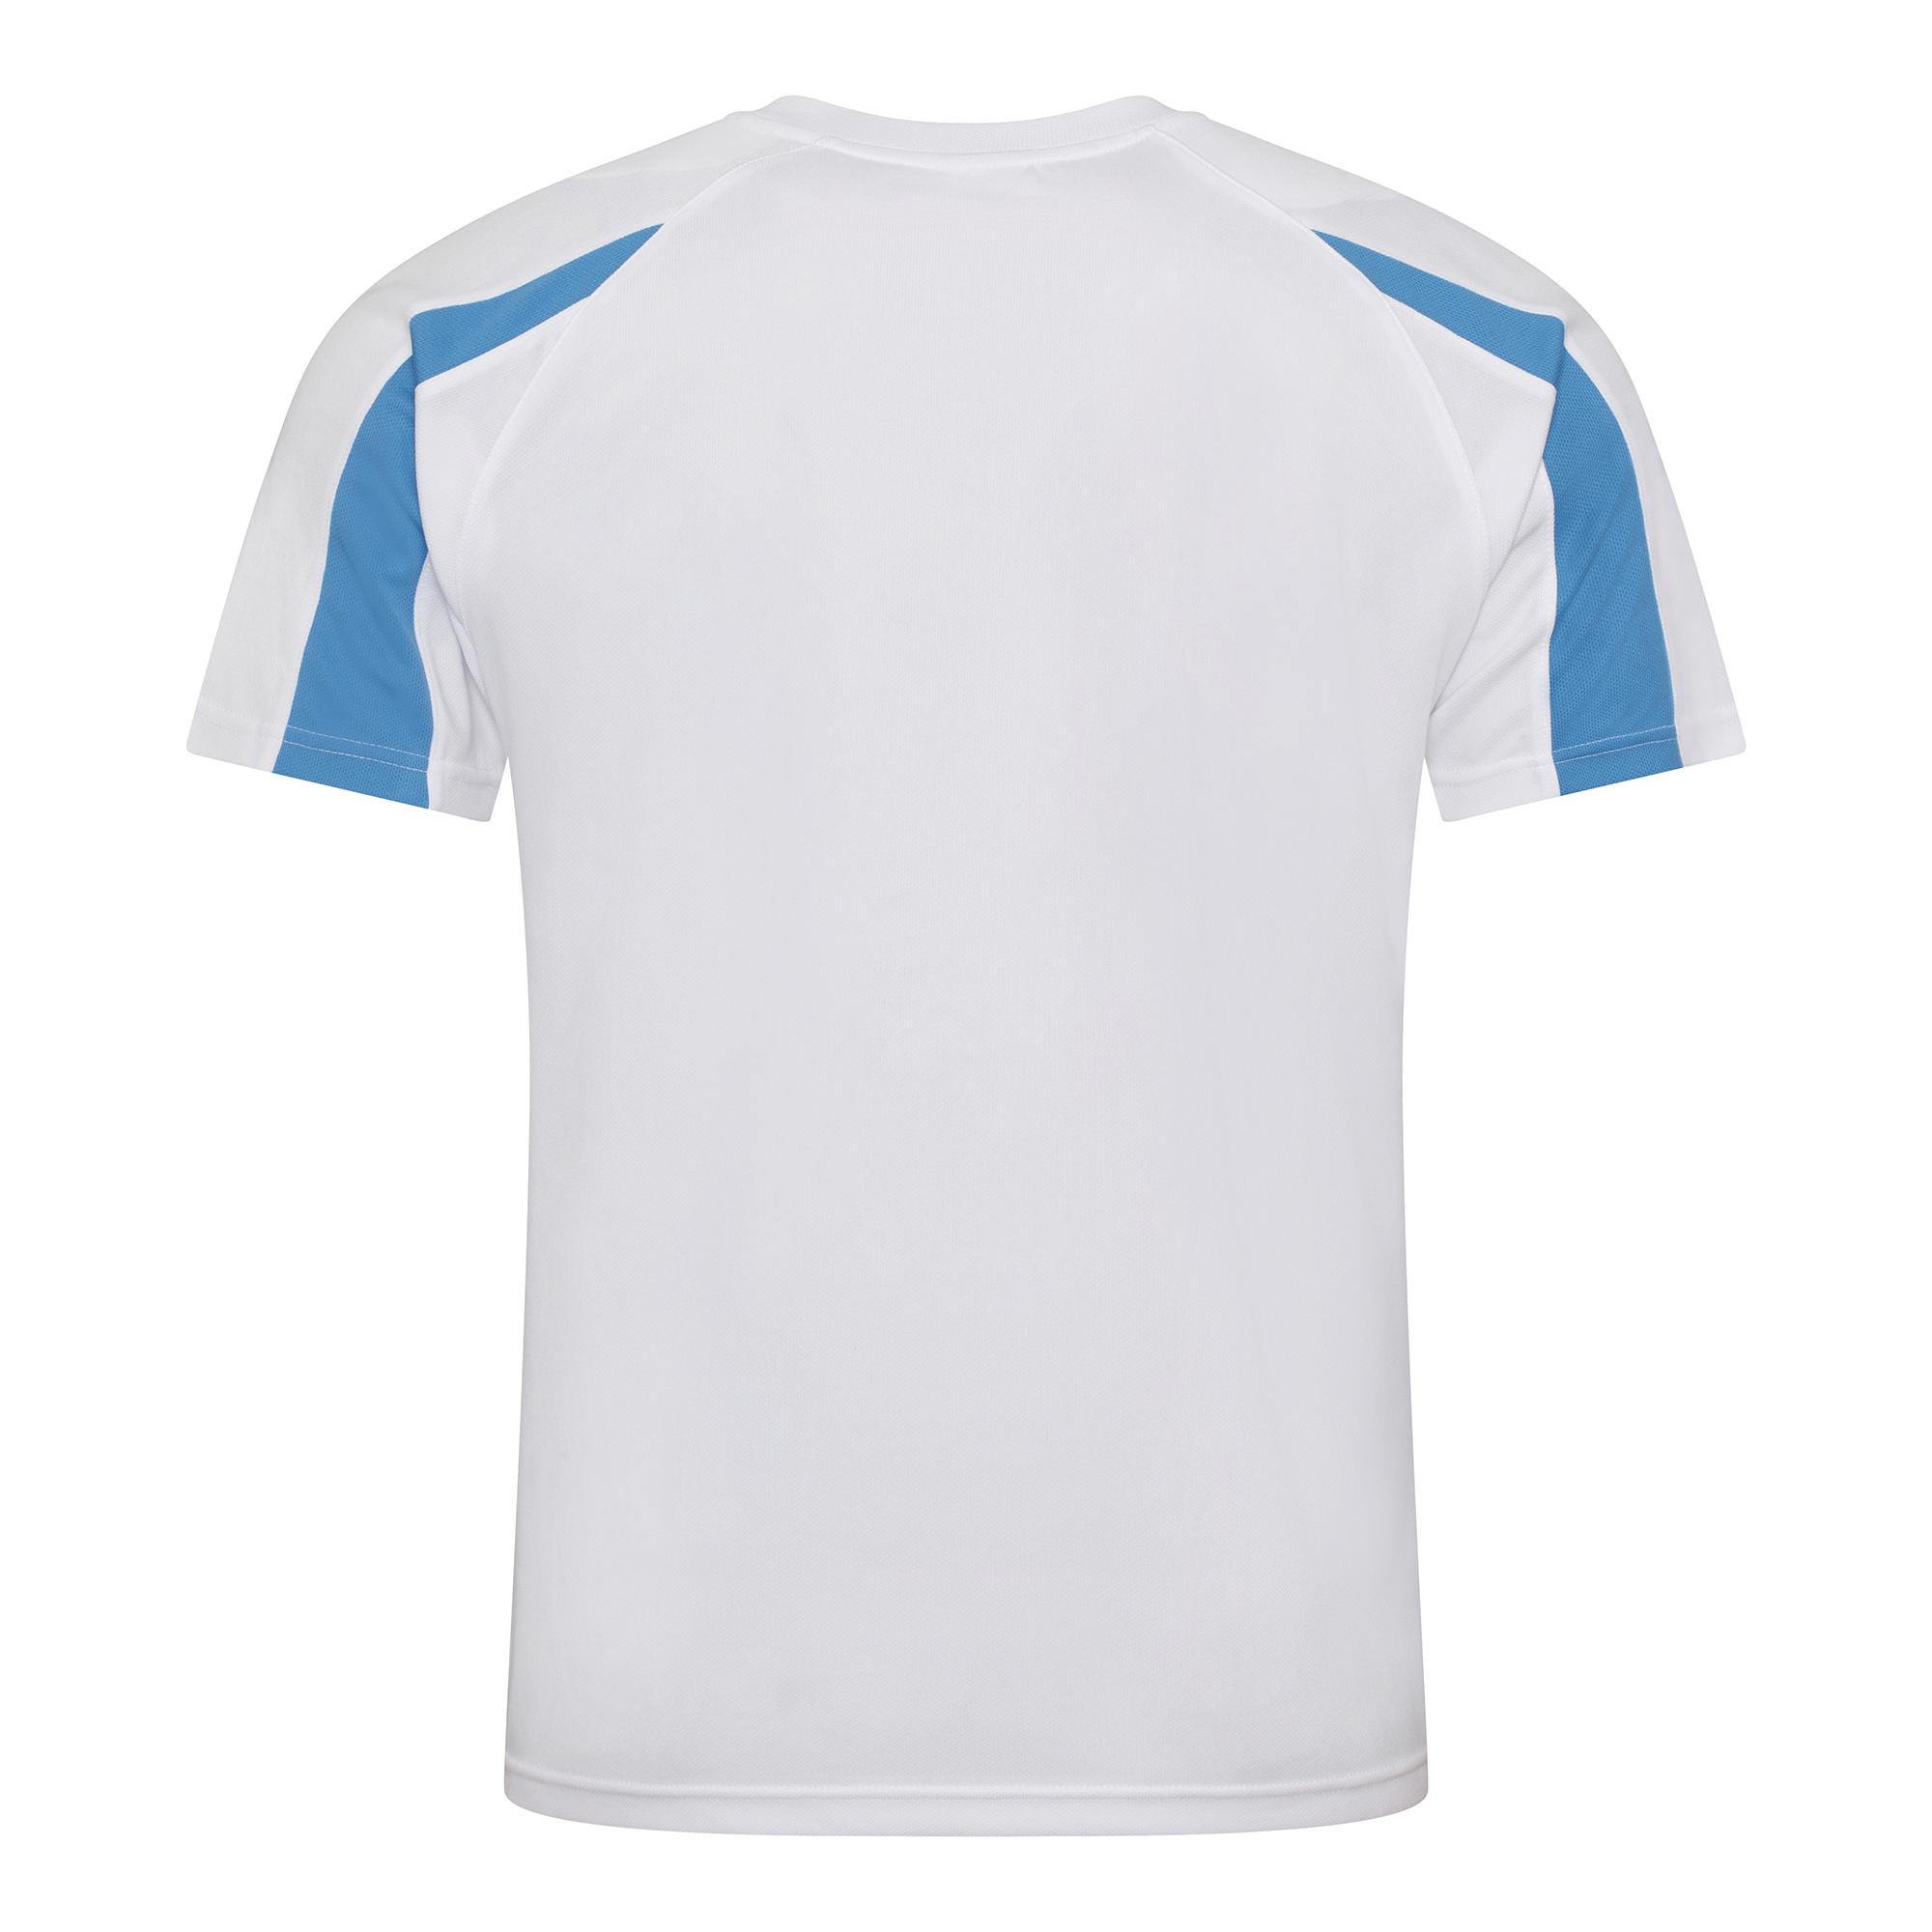 Just cool mens contrast cool sports plain t shirt ebay for Mens sport t shirts